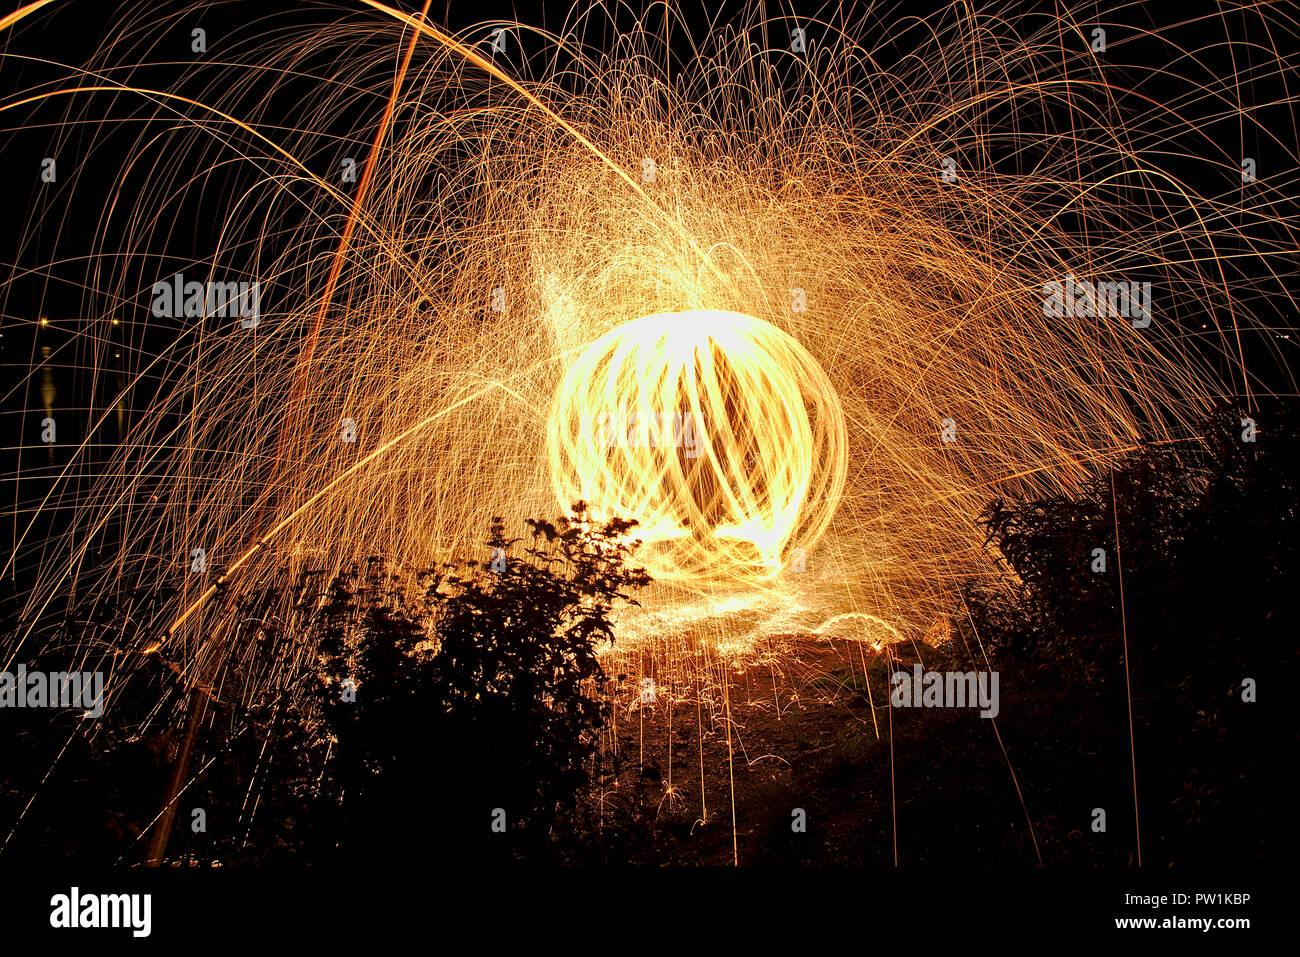 light painting, fireball by night - Stock Image